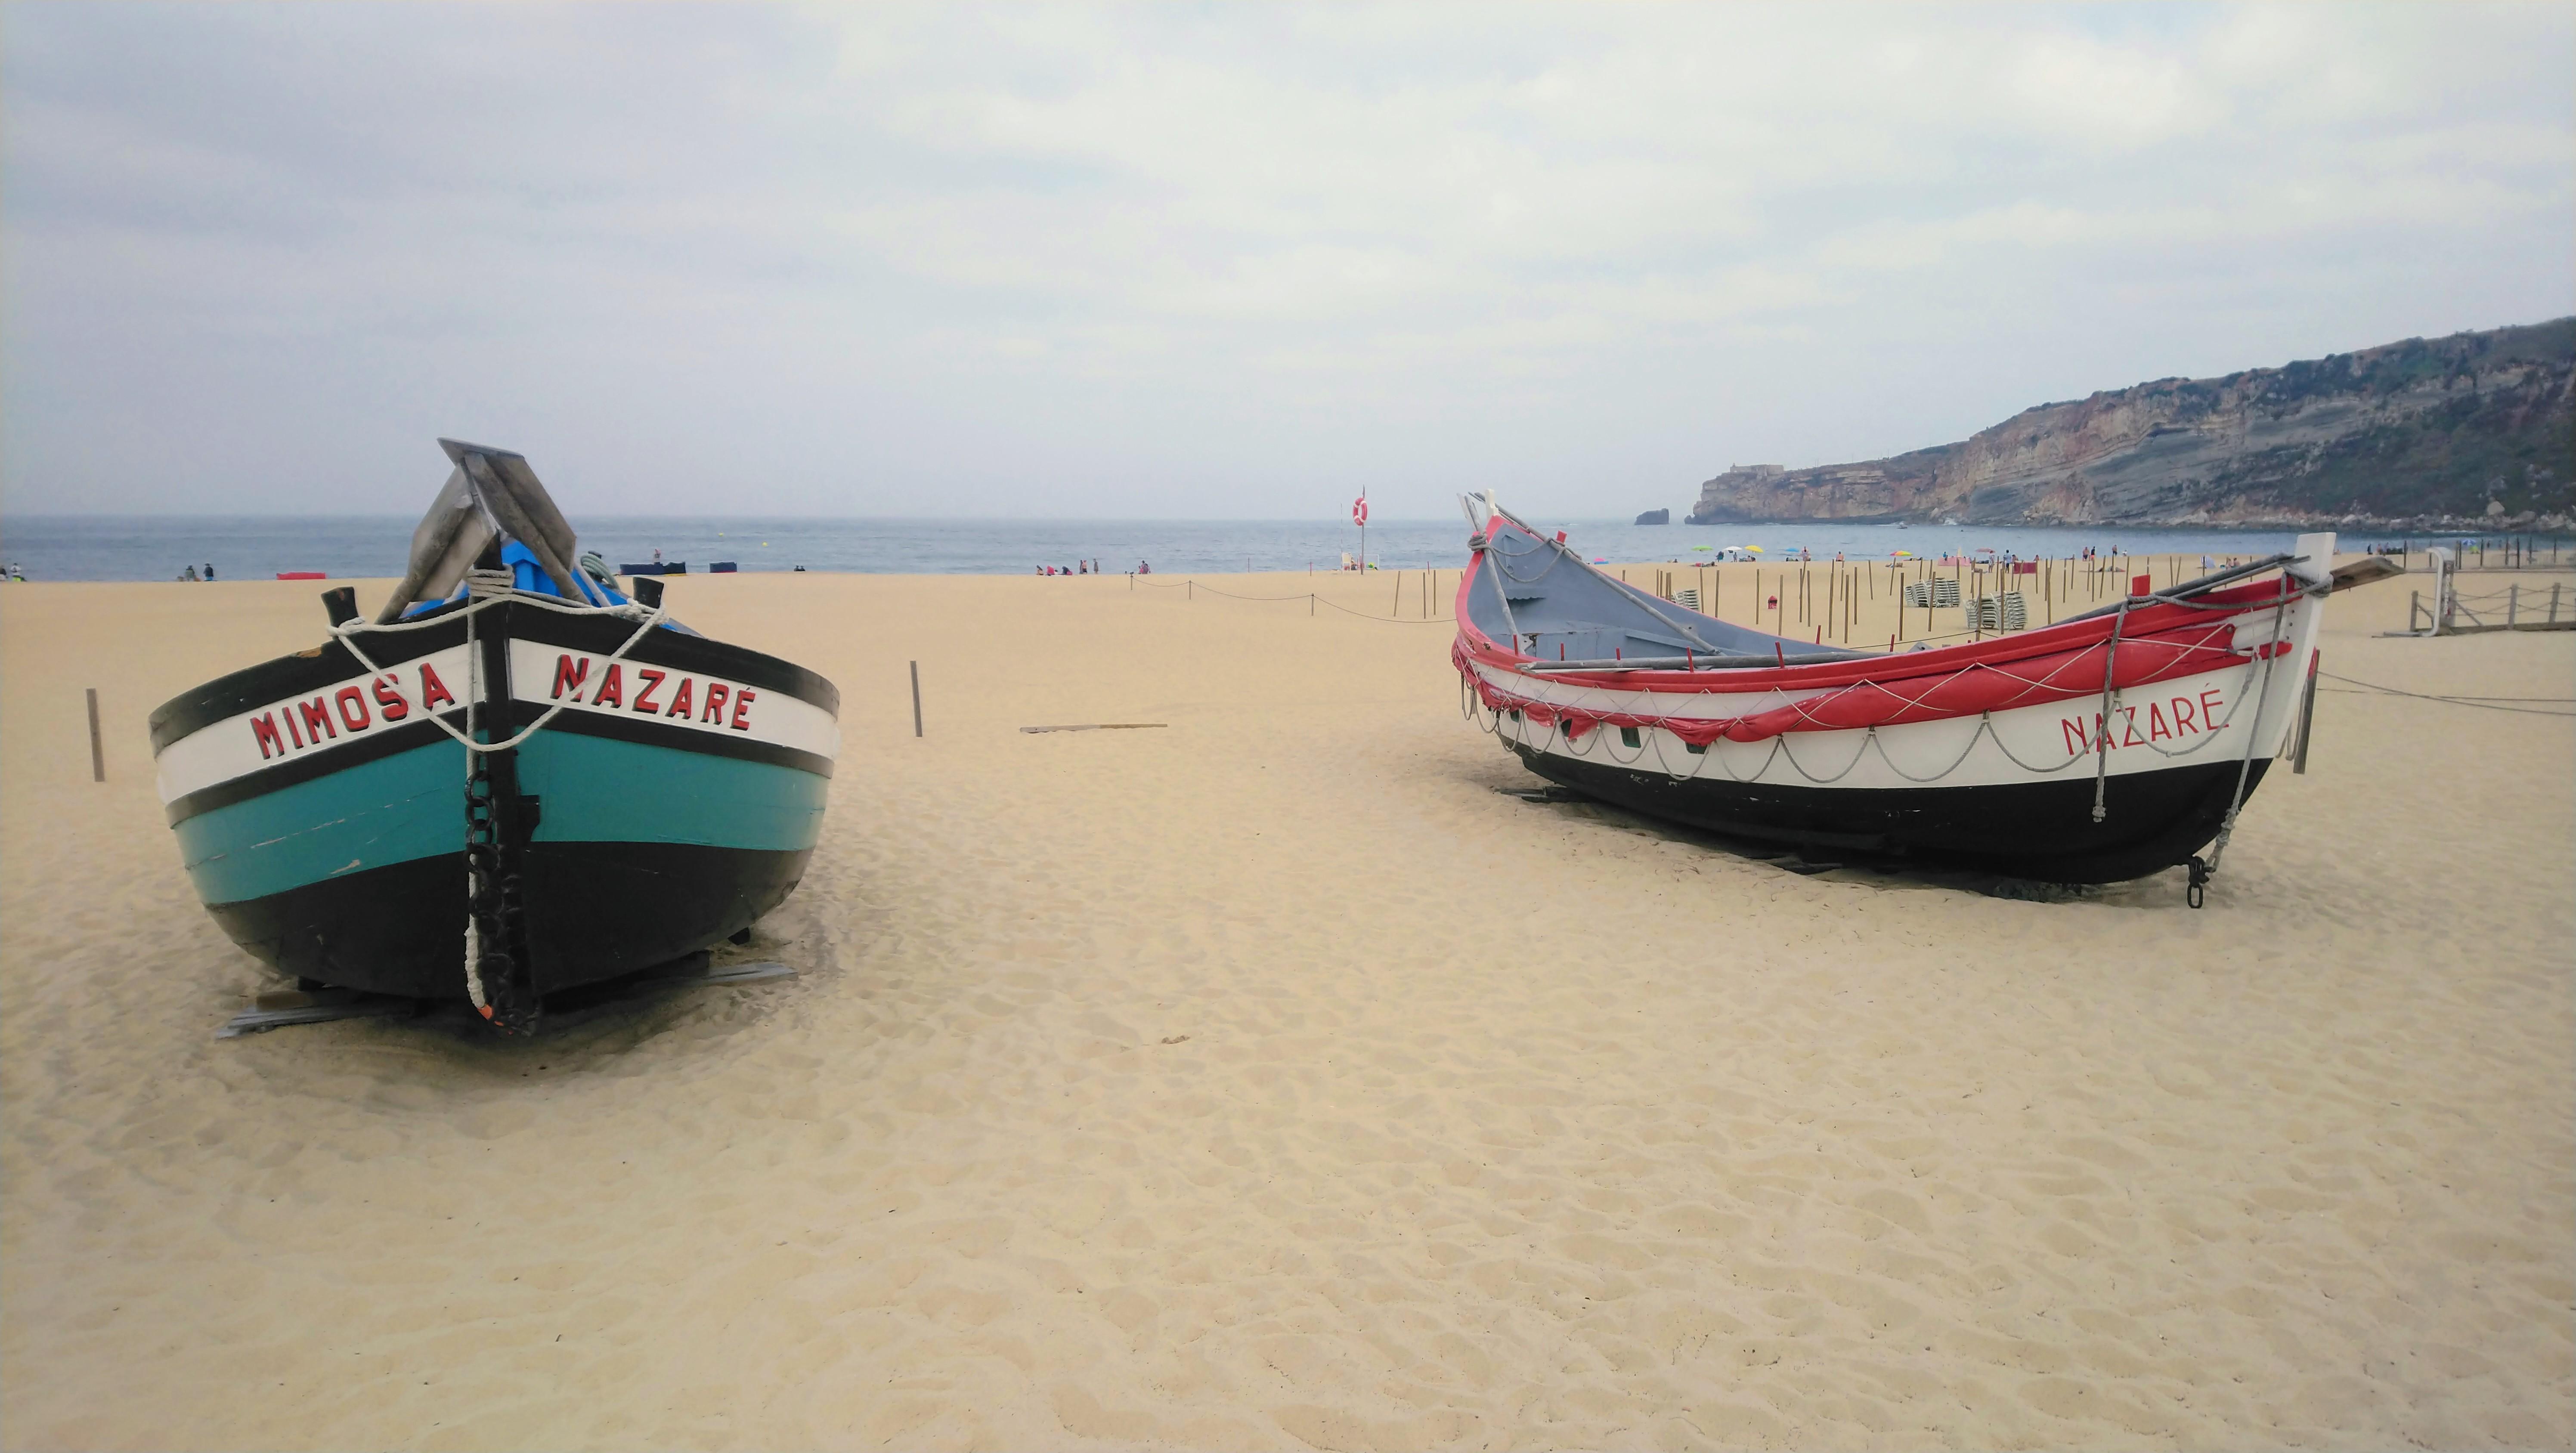 Notre Road Trip au PORTUGAL